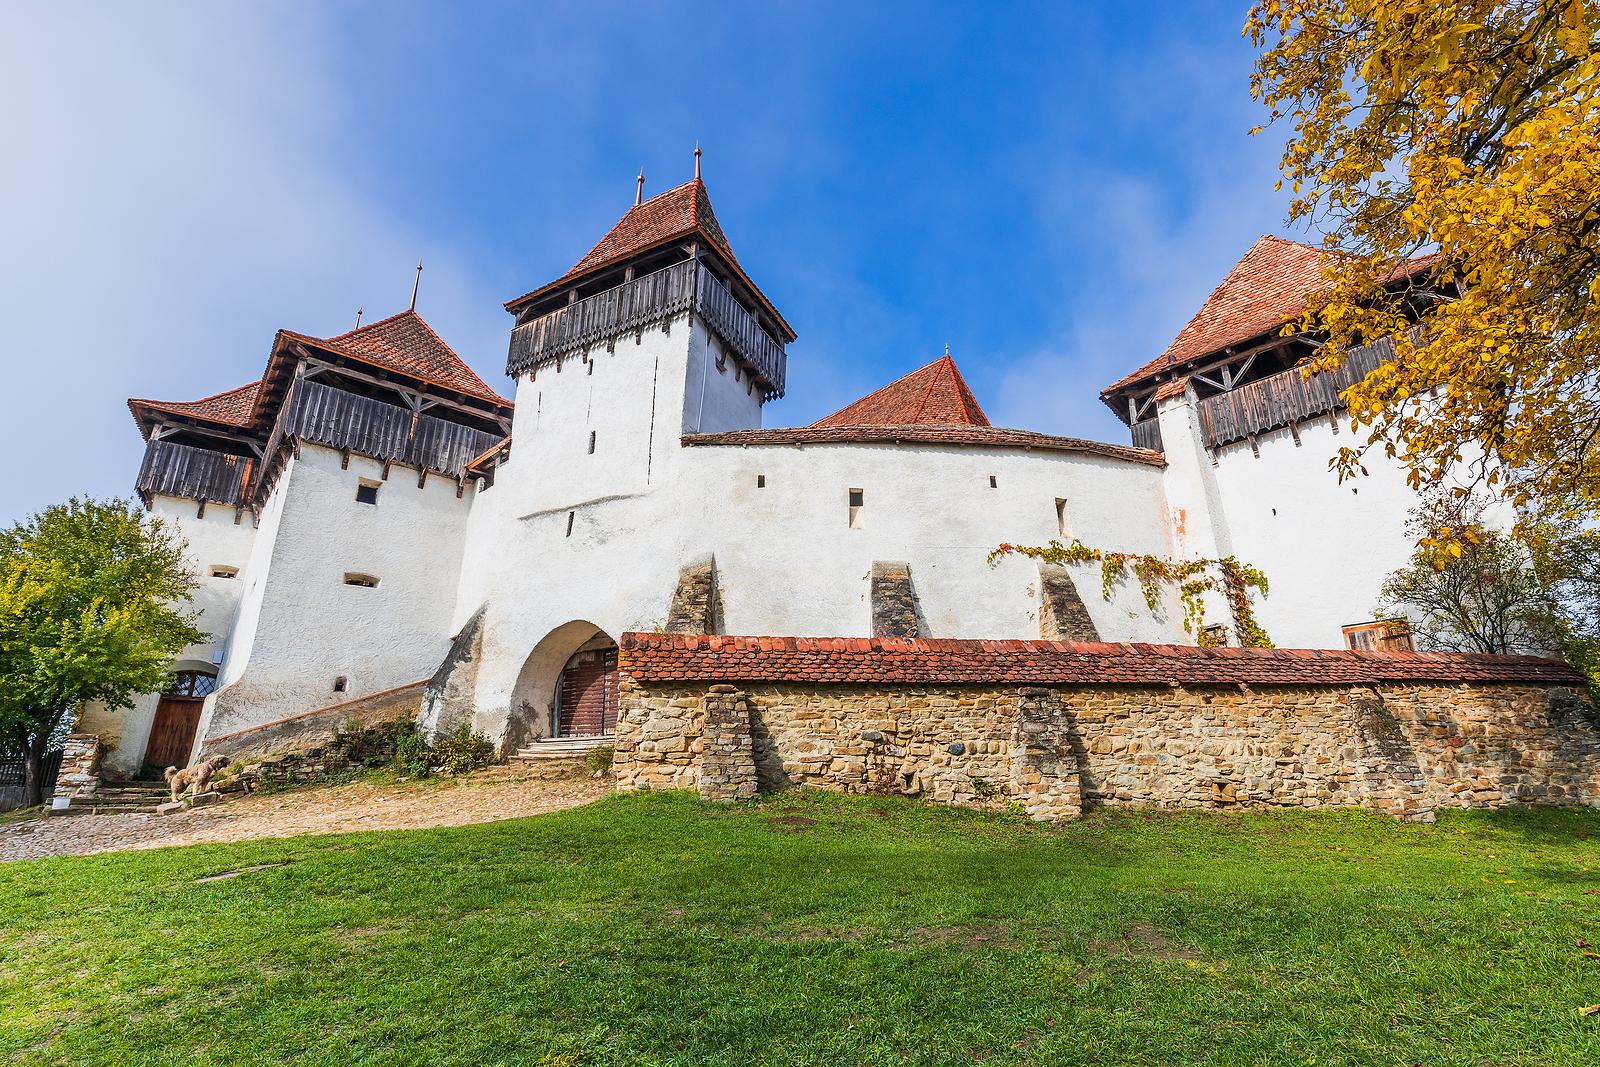 The fortified church at Viscri